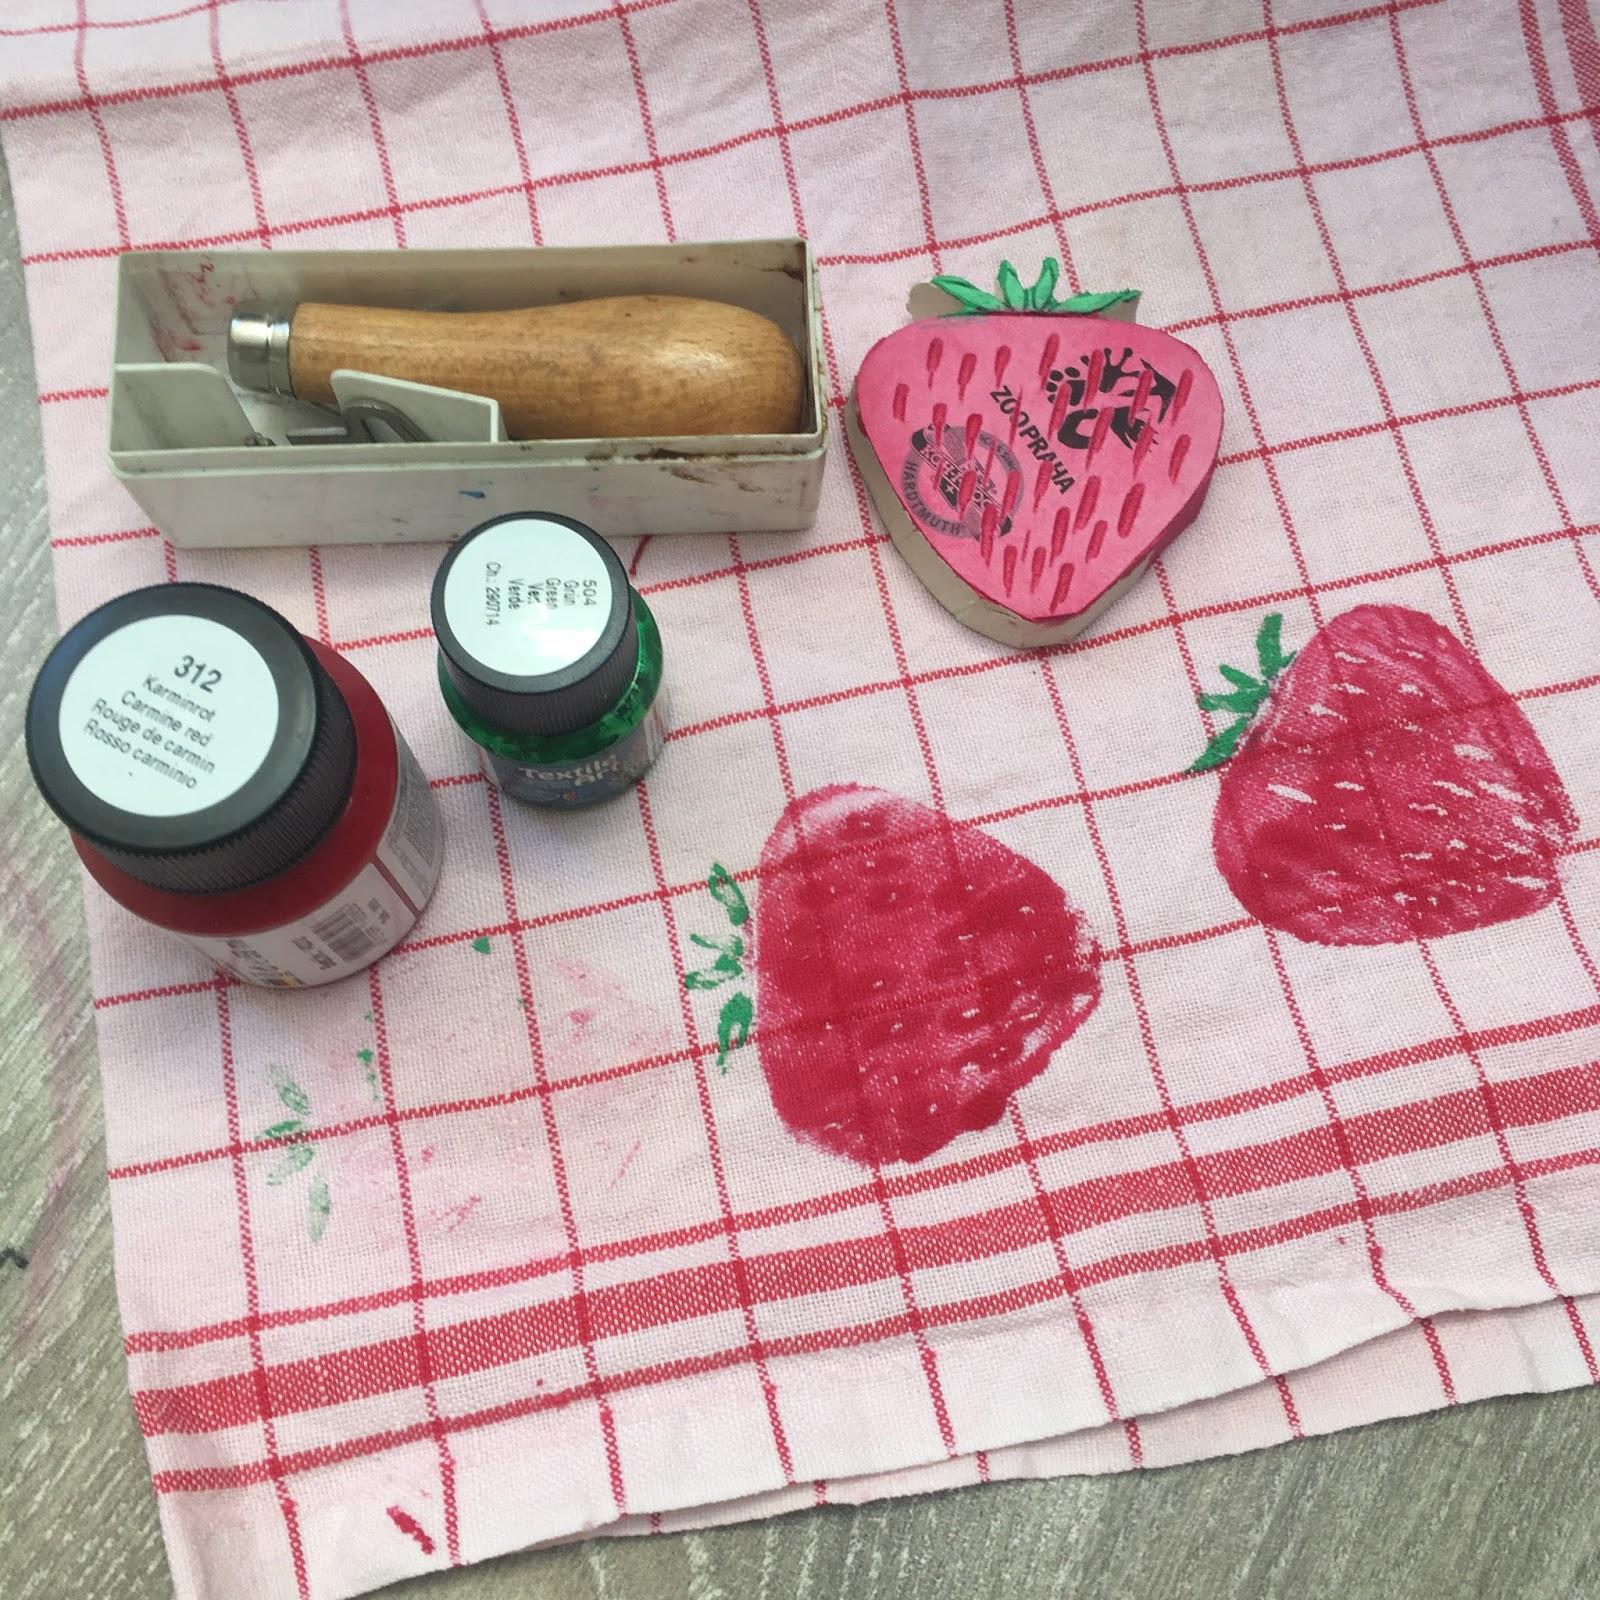 razítko na textil ve tvaru jahody DIY výroba razítka jahoda linoryt